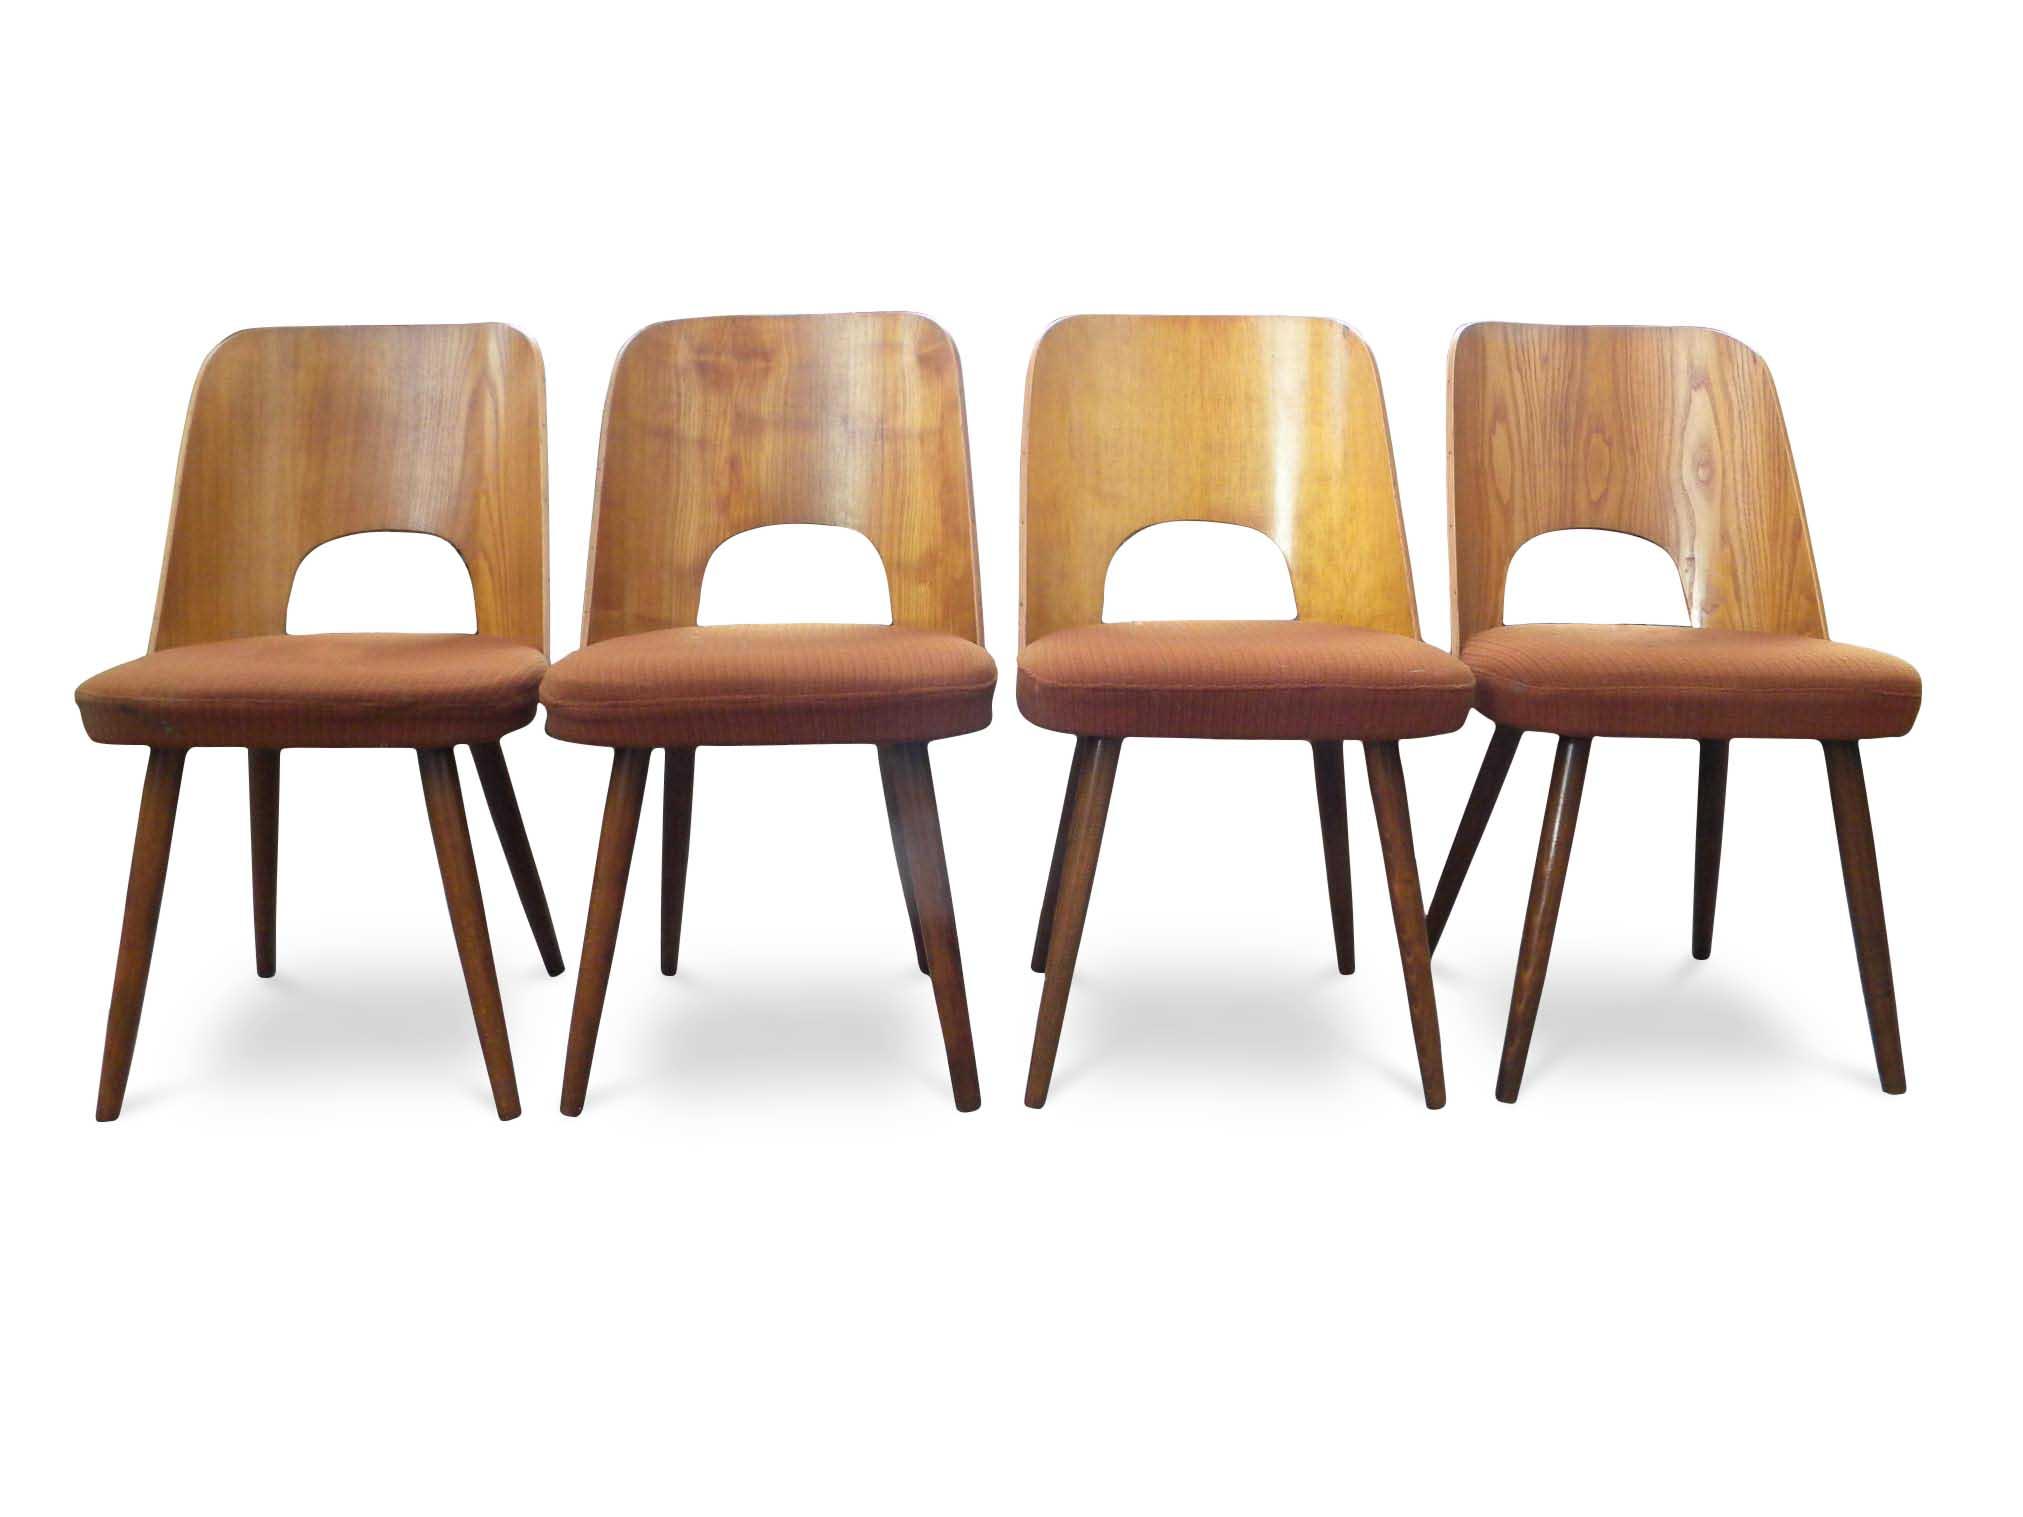 Sedie In Legno Anni 50 60.Sedie Vintage Anni 50 Modernariato Italian Vintage Sofa